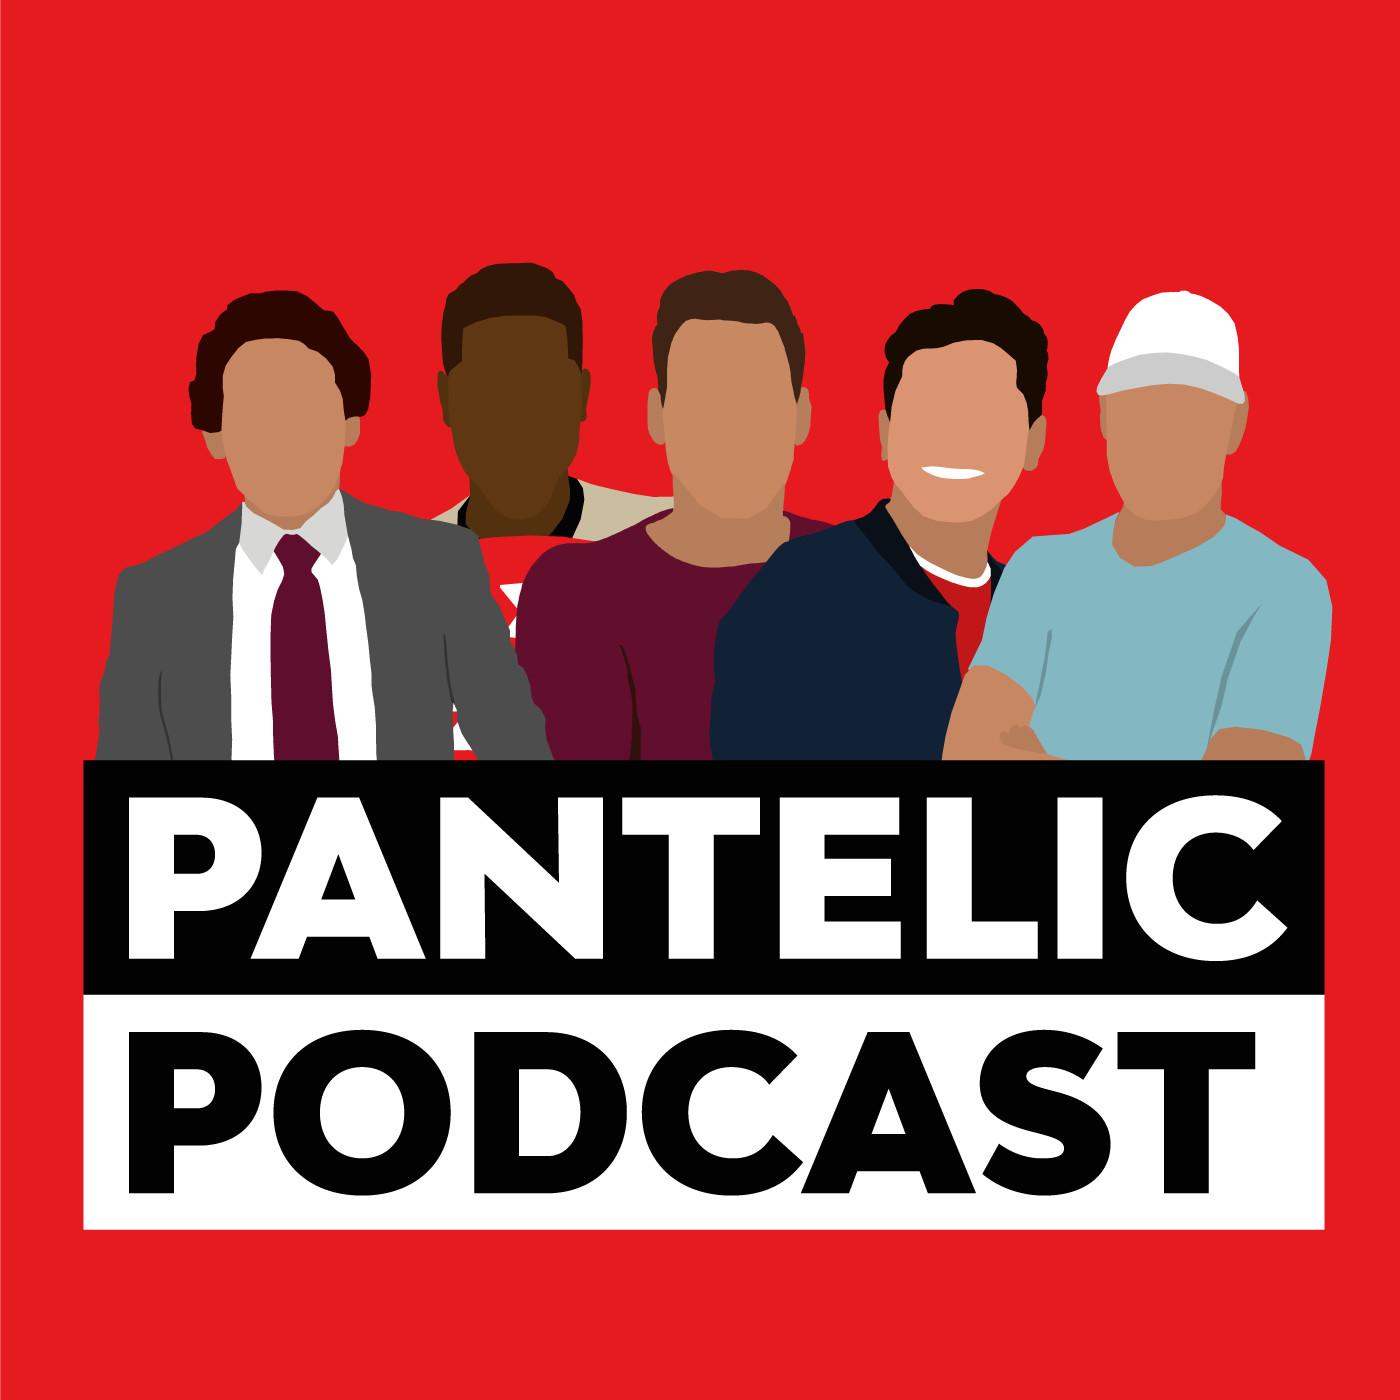 Pantelic Podcast logo